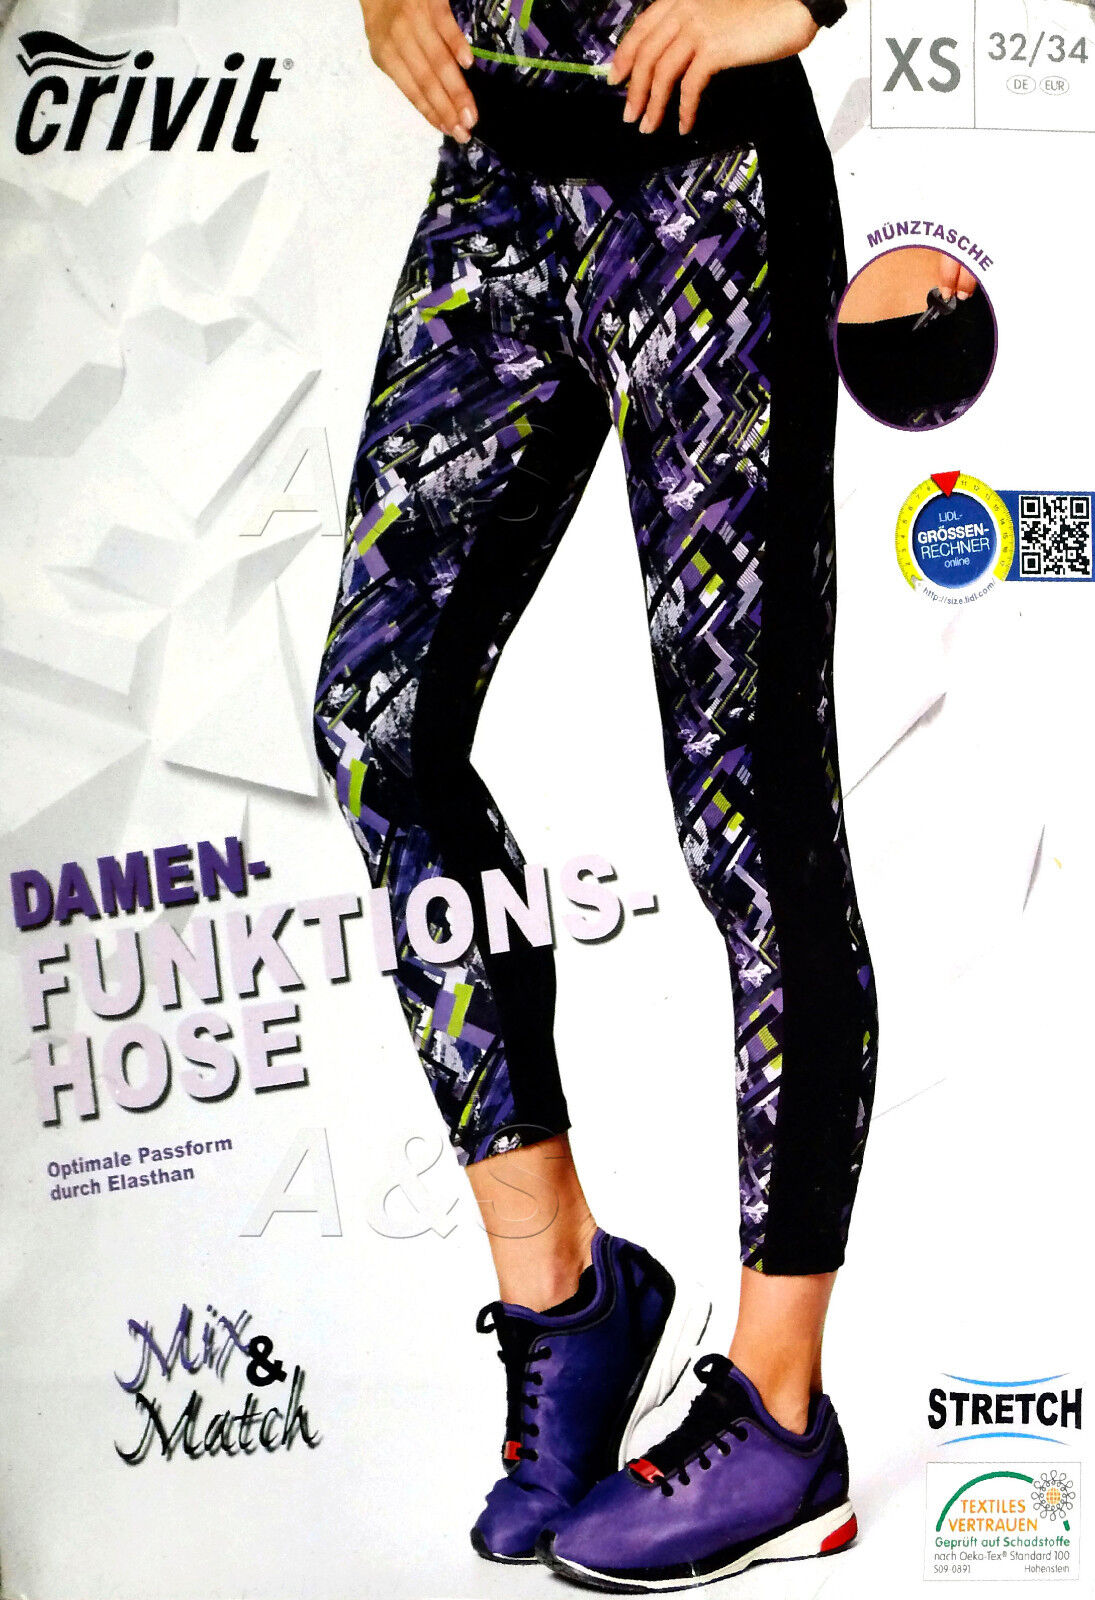 CRIVIT Damen Funktionshose Laufhose Sporthose Fitnesshose Trainings leggins NEU